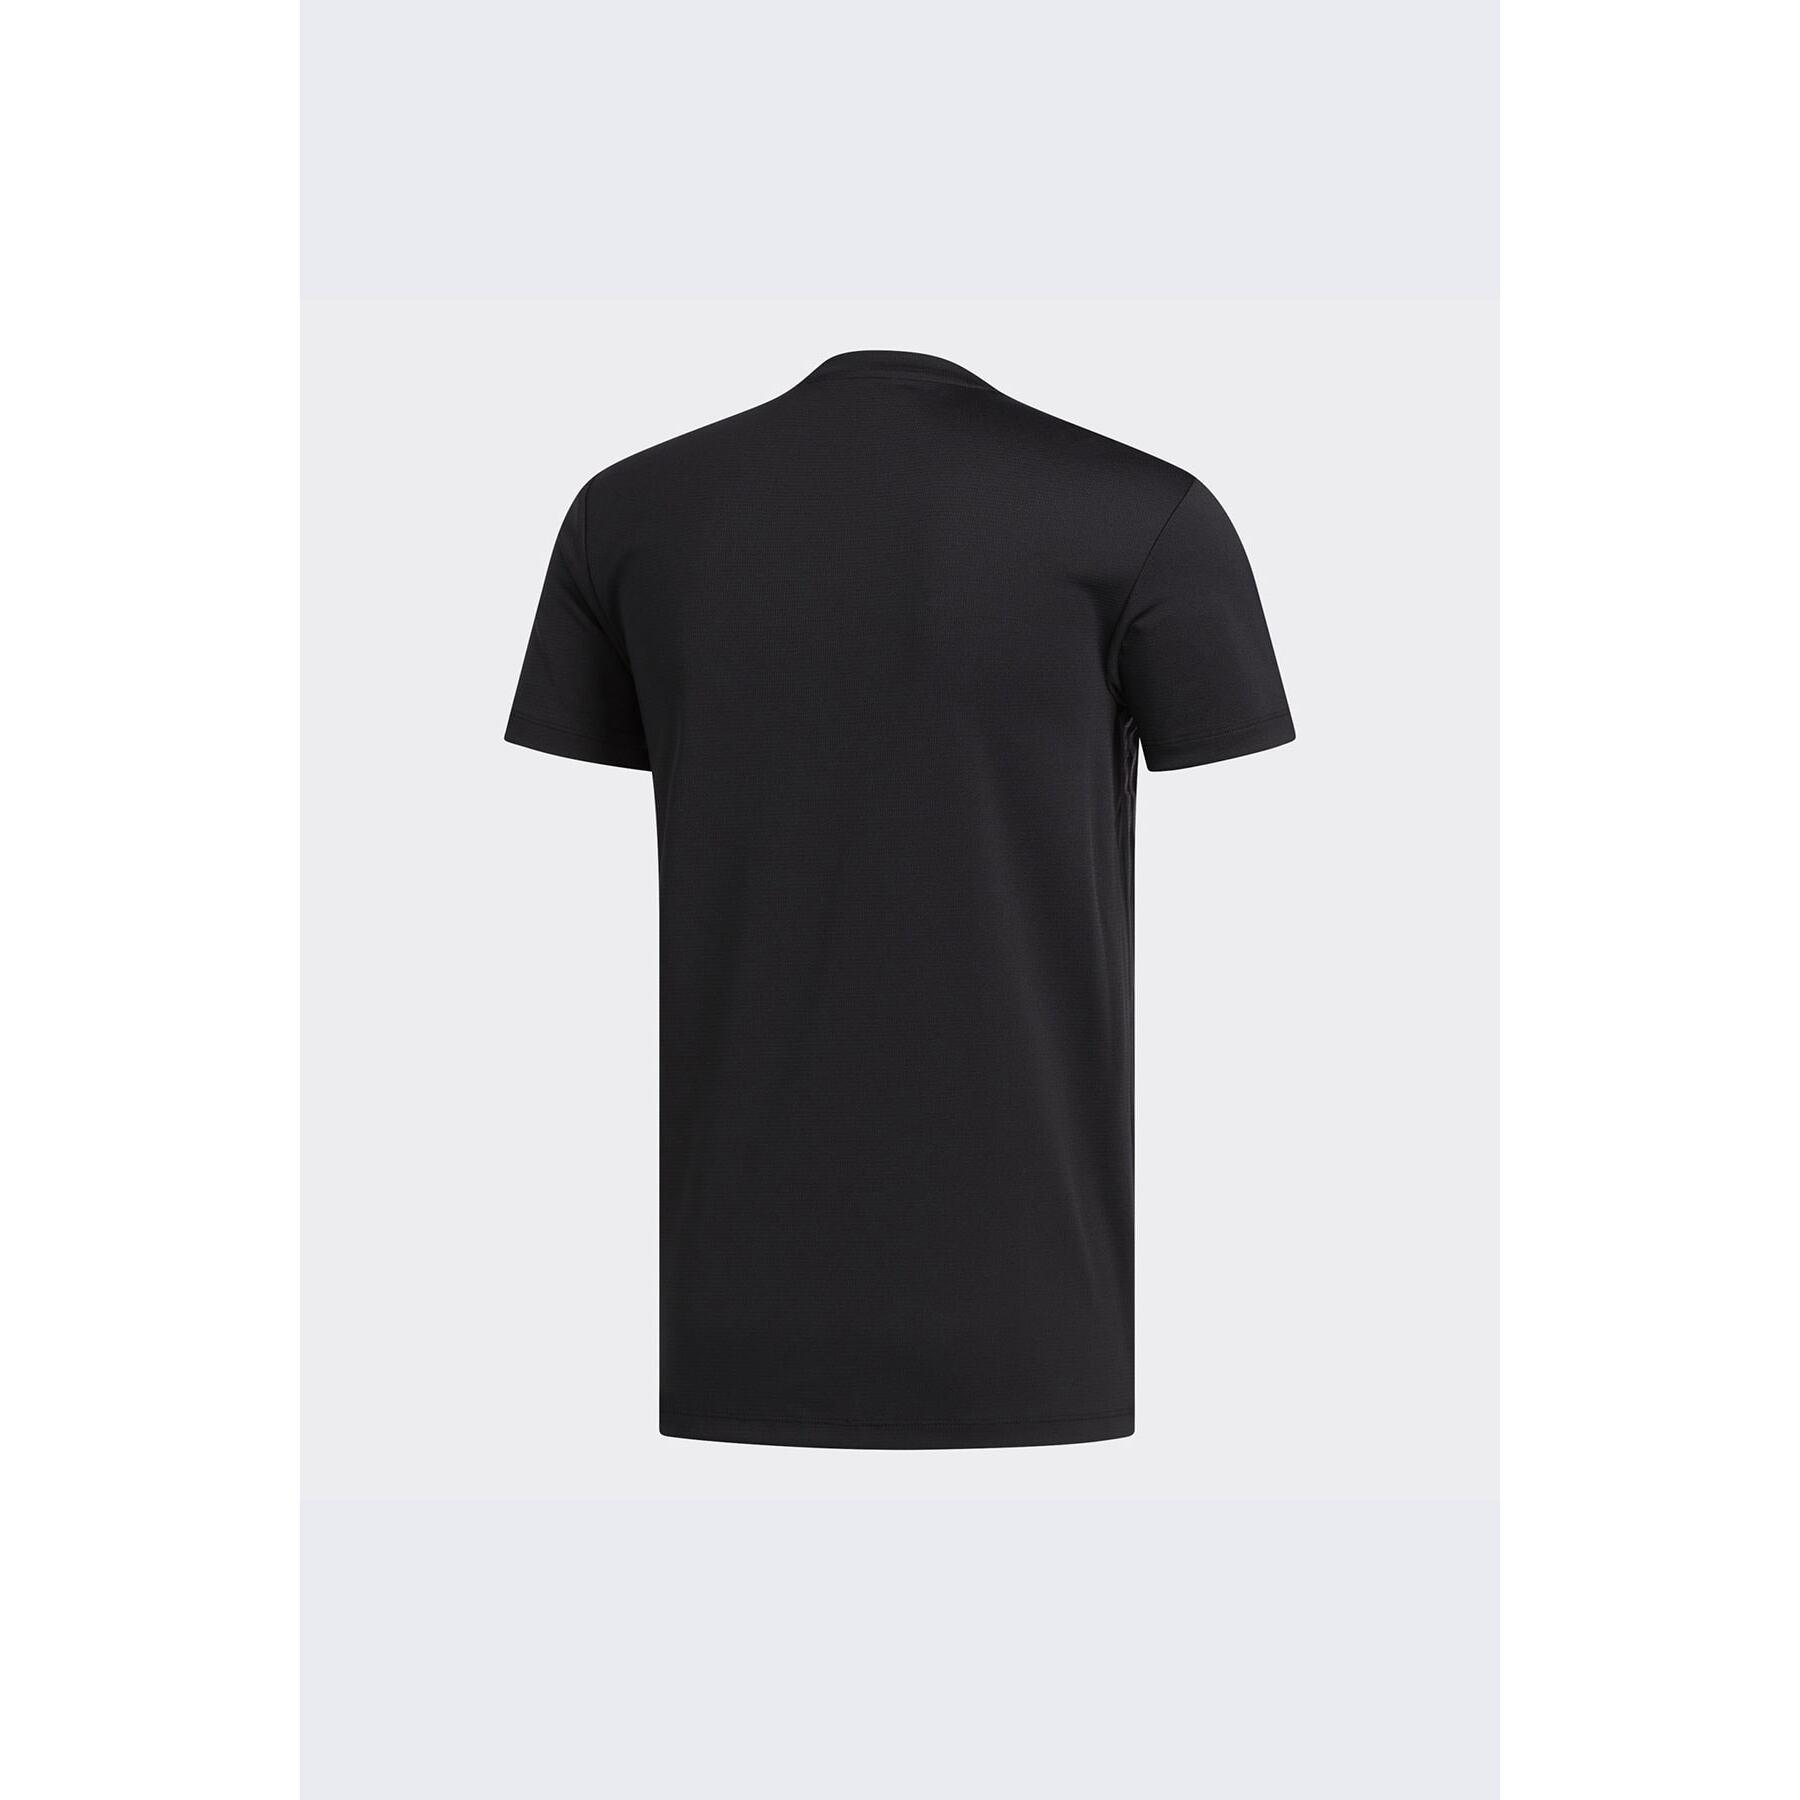 Aeroready 3-Stripes Erkek Siyah Antrenman Tişörtü